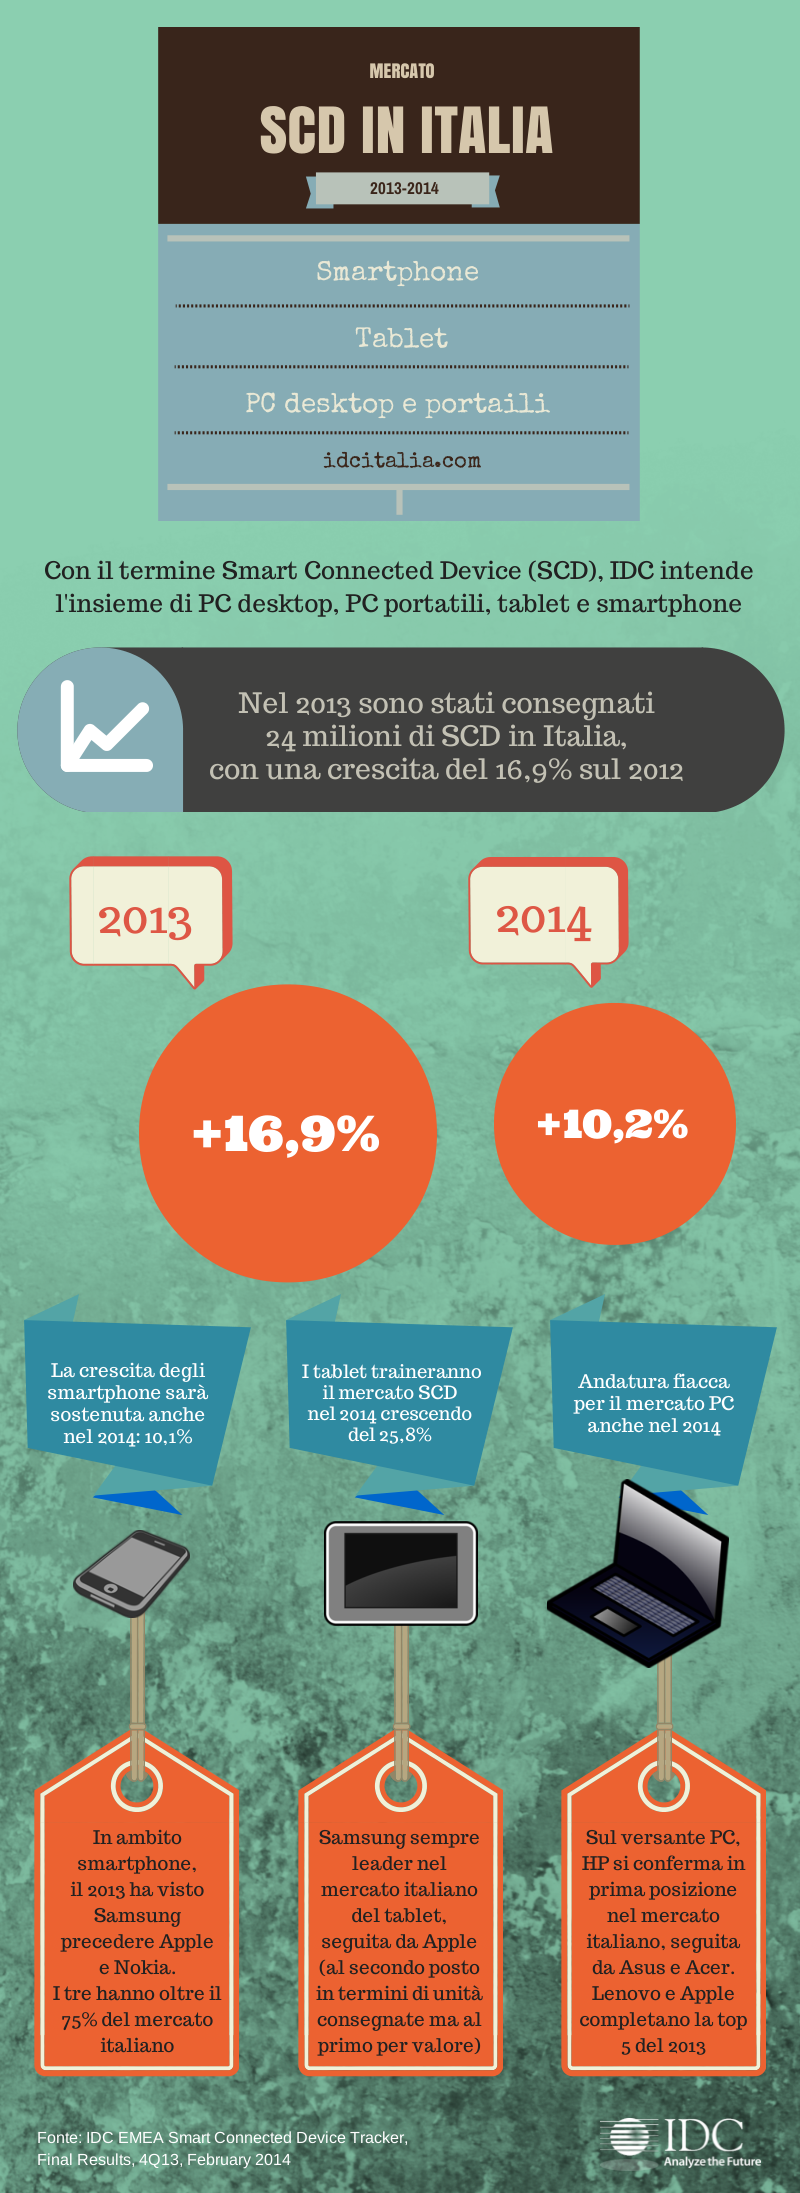 italy_infografica_scd_in_italia